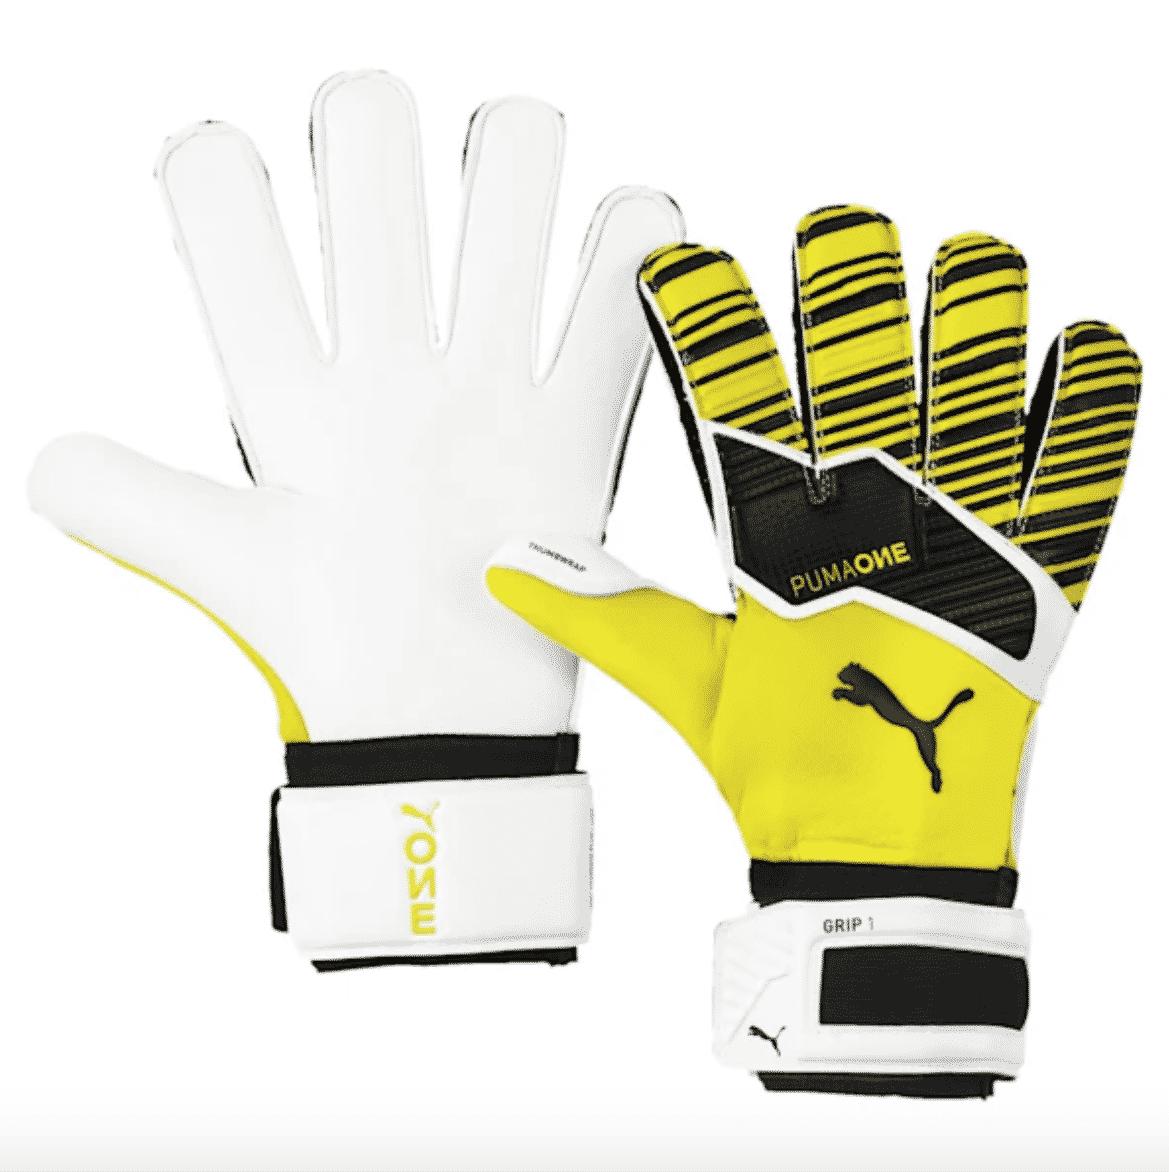 puma-one-gants-football